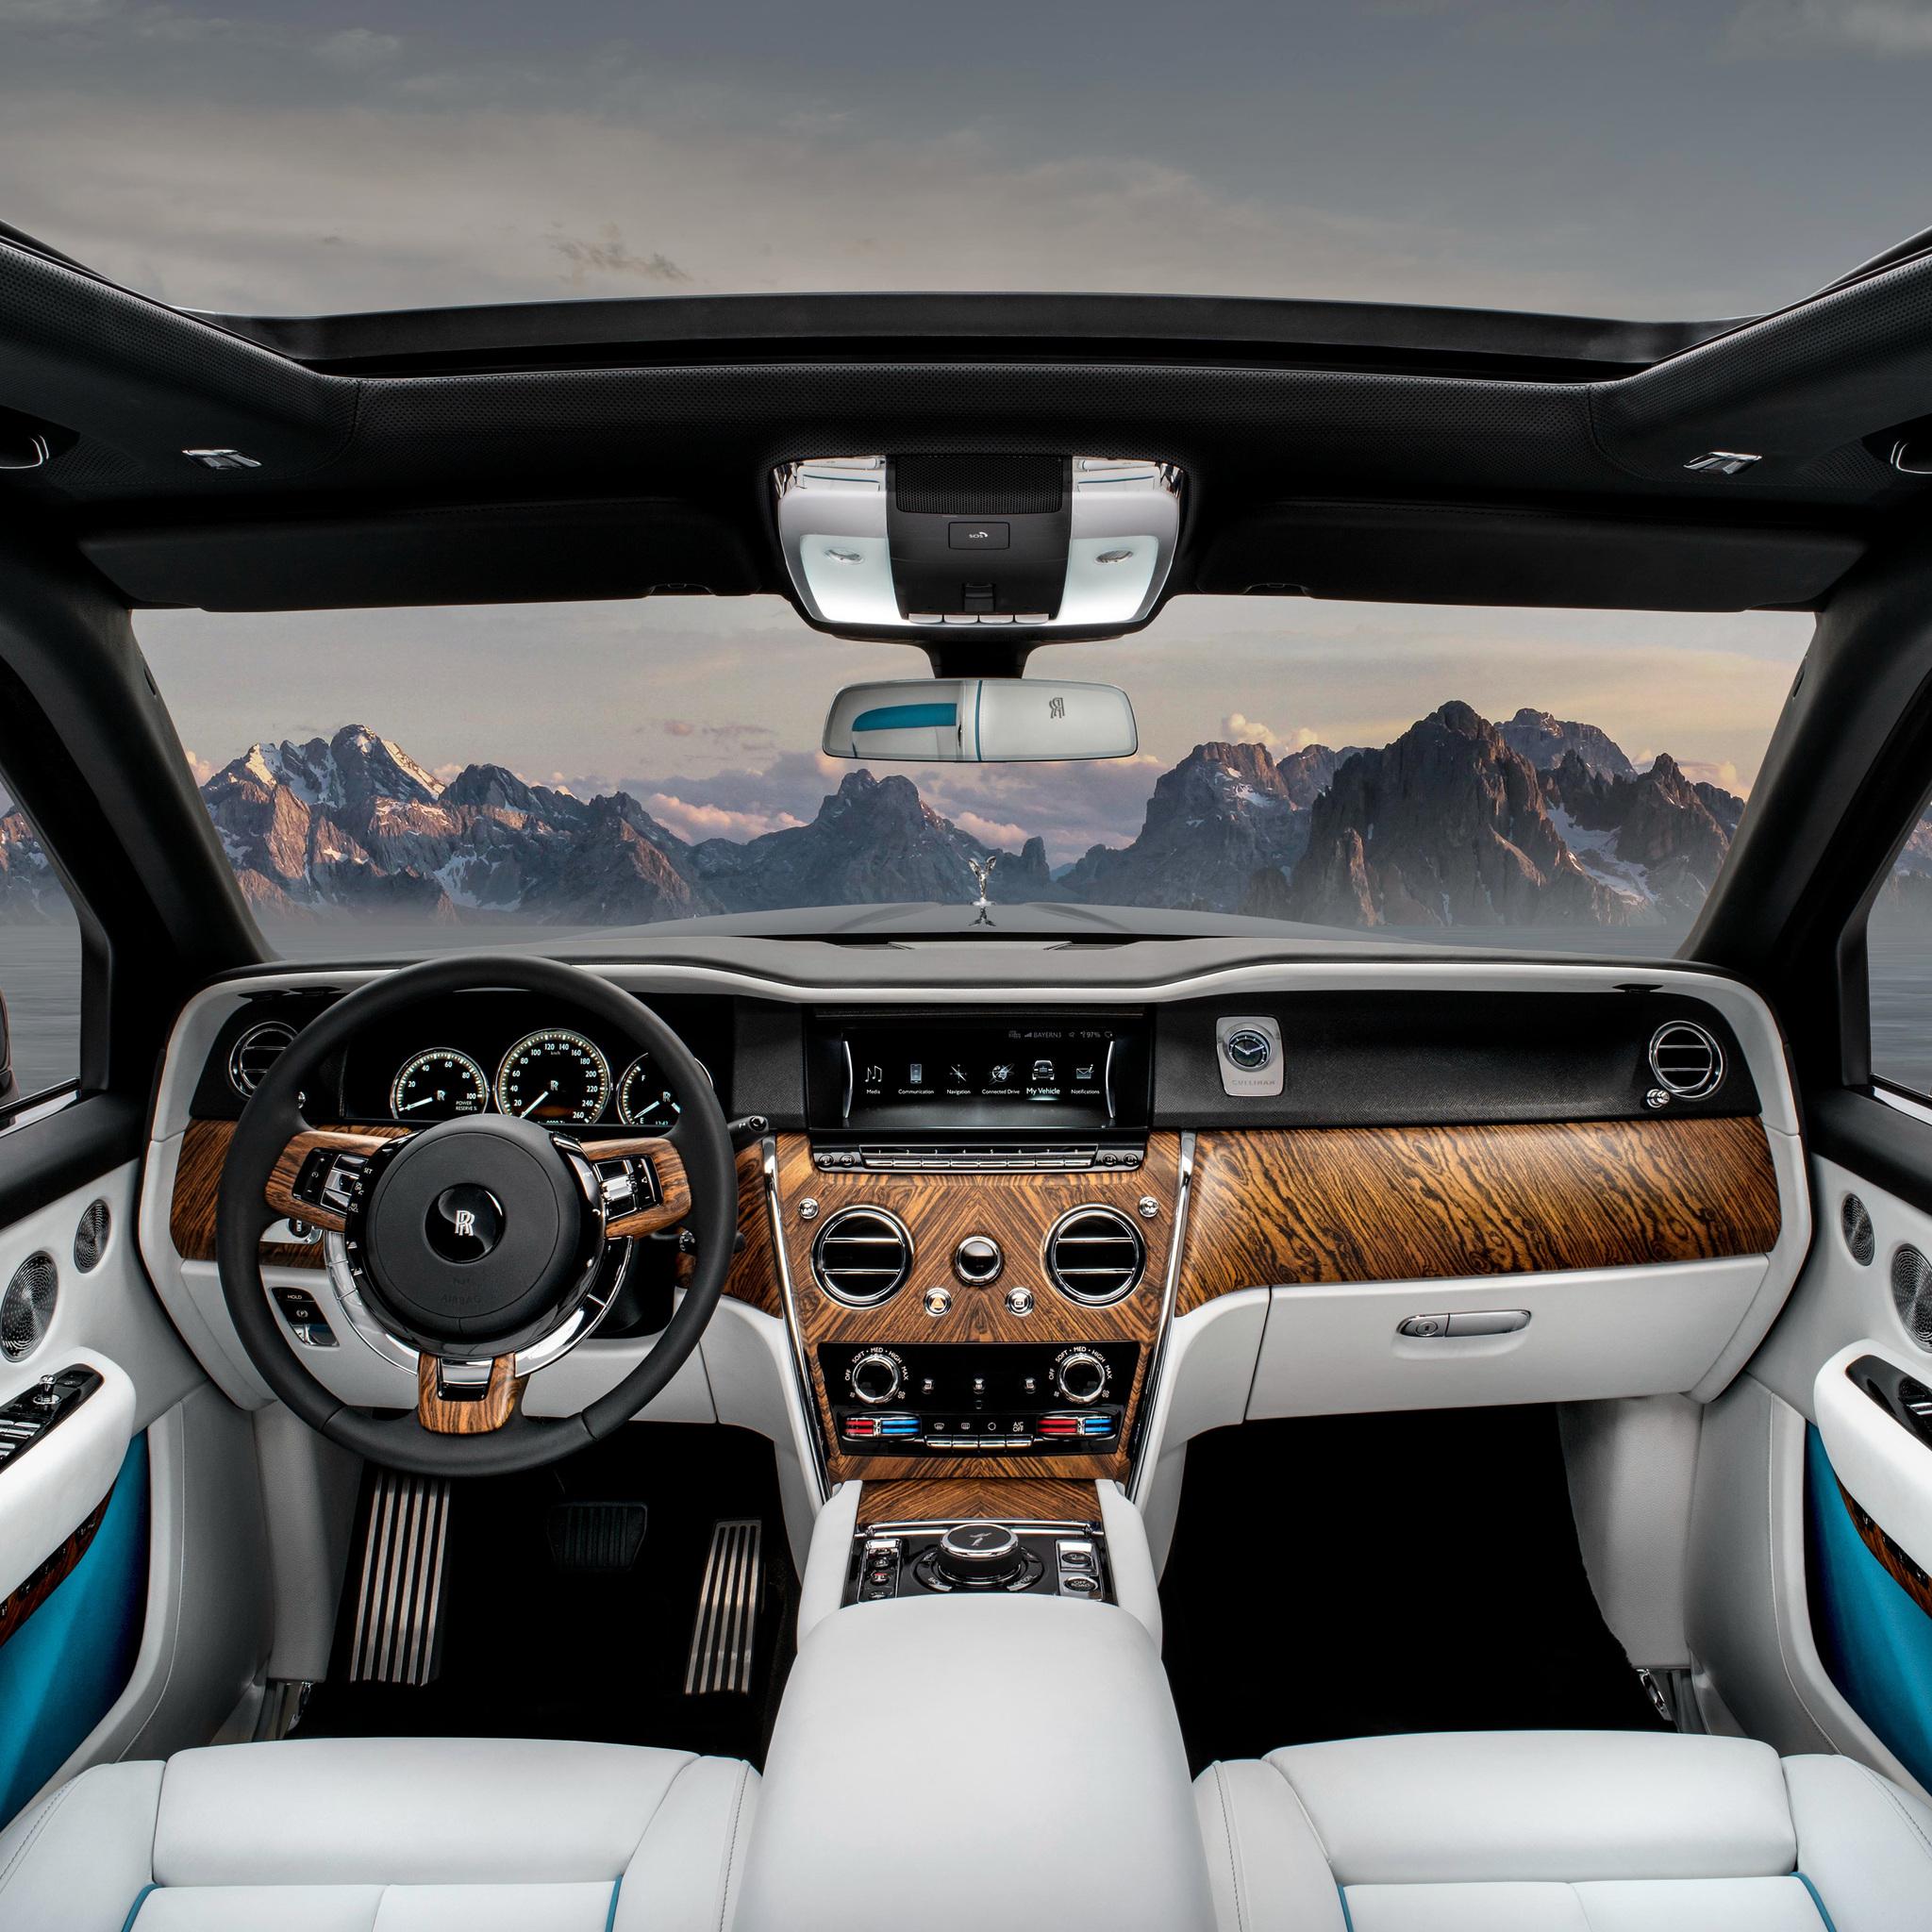 2048x2048 Rolls Royce Cullinan Interior Ipad Air HD 4k